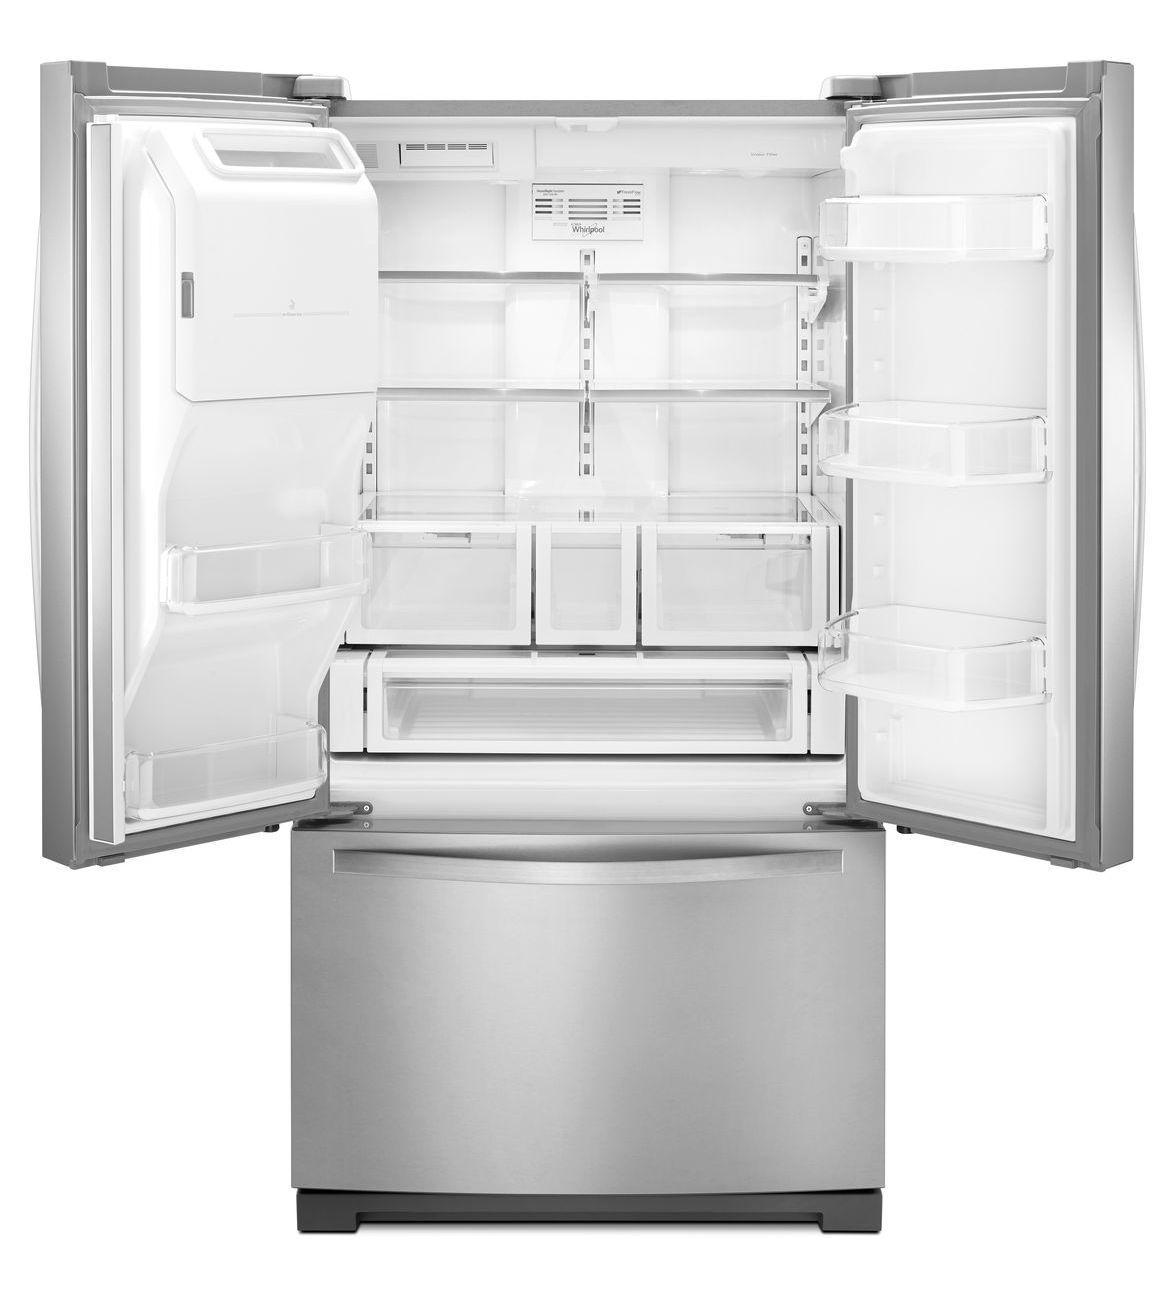 Wrf757sdem Whirlpool Wrf757sdem Refrigerator